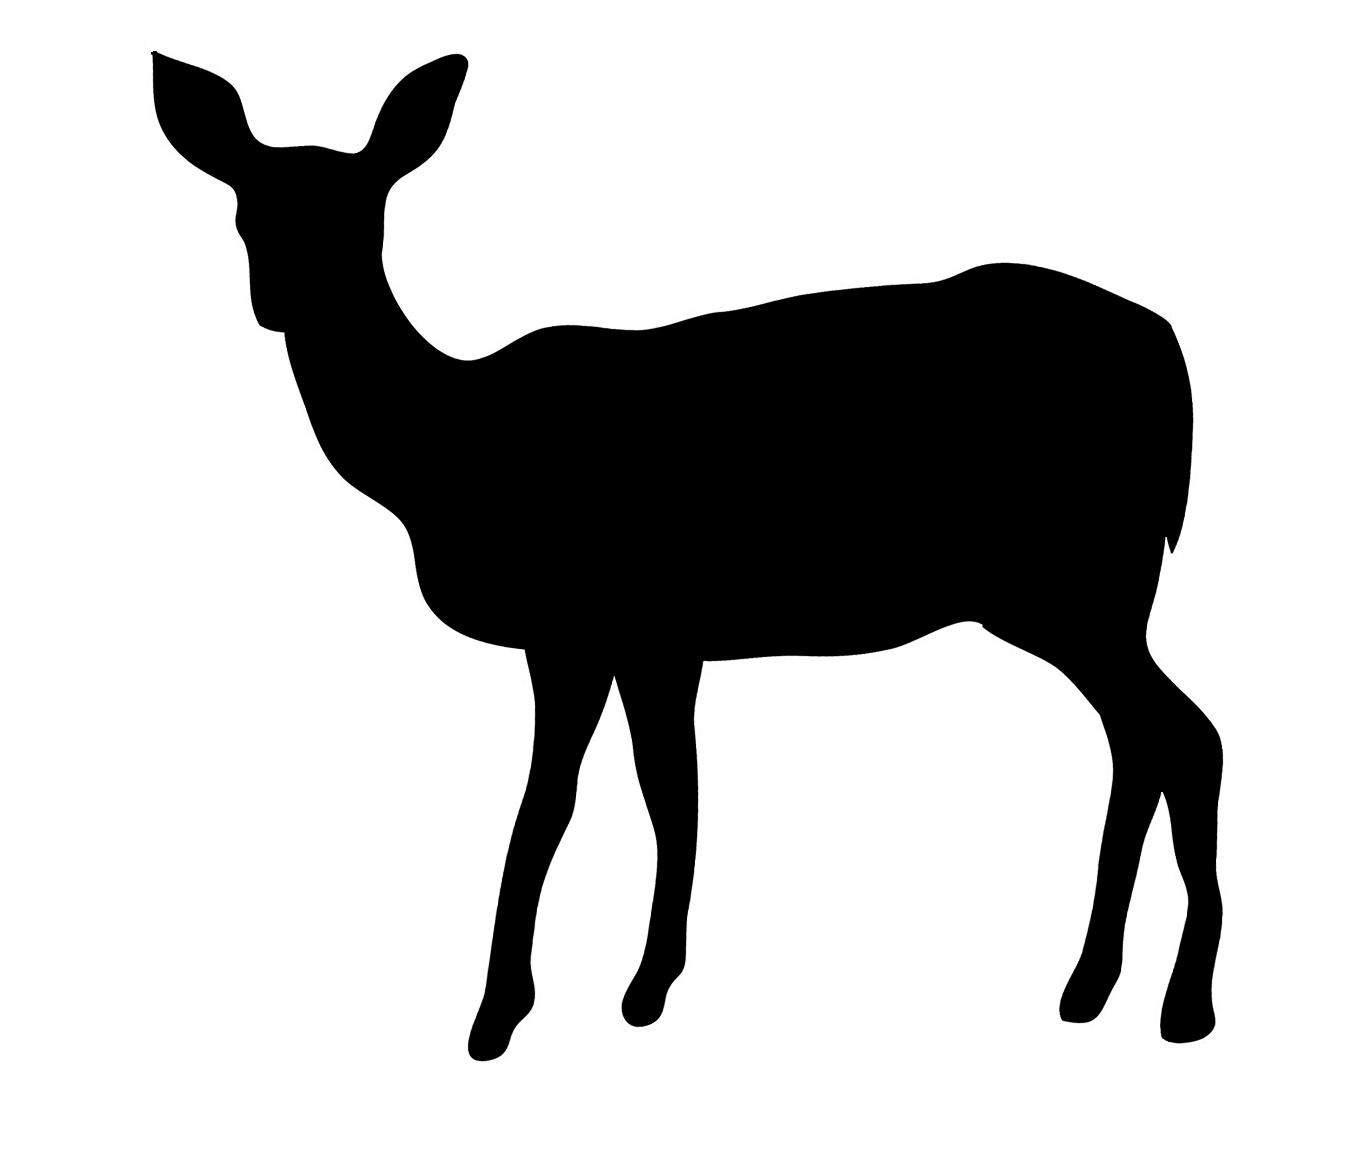 1349x1173 Deer Silhouette Clipart